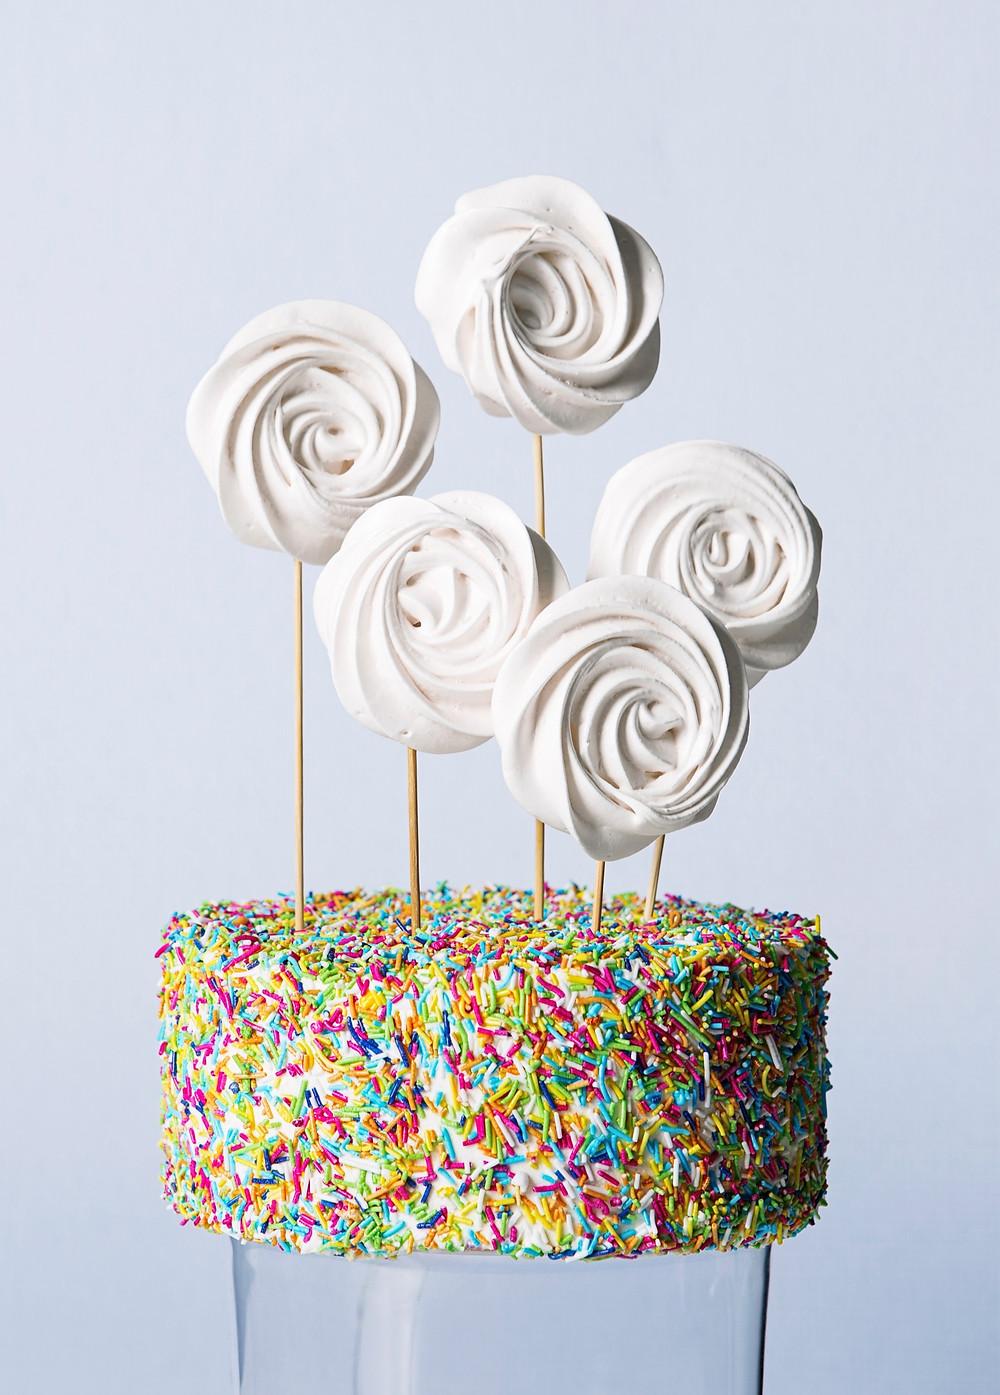 Tortas, biskvitinis tortas, mangų kremas, sviestinis kremas, gimtadienio idėjos, gimtadienio tortas, Alfo Ivanausko receptai, vmgonline.lt